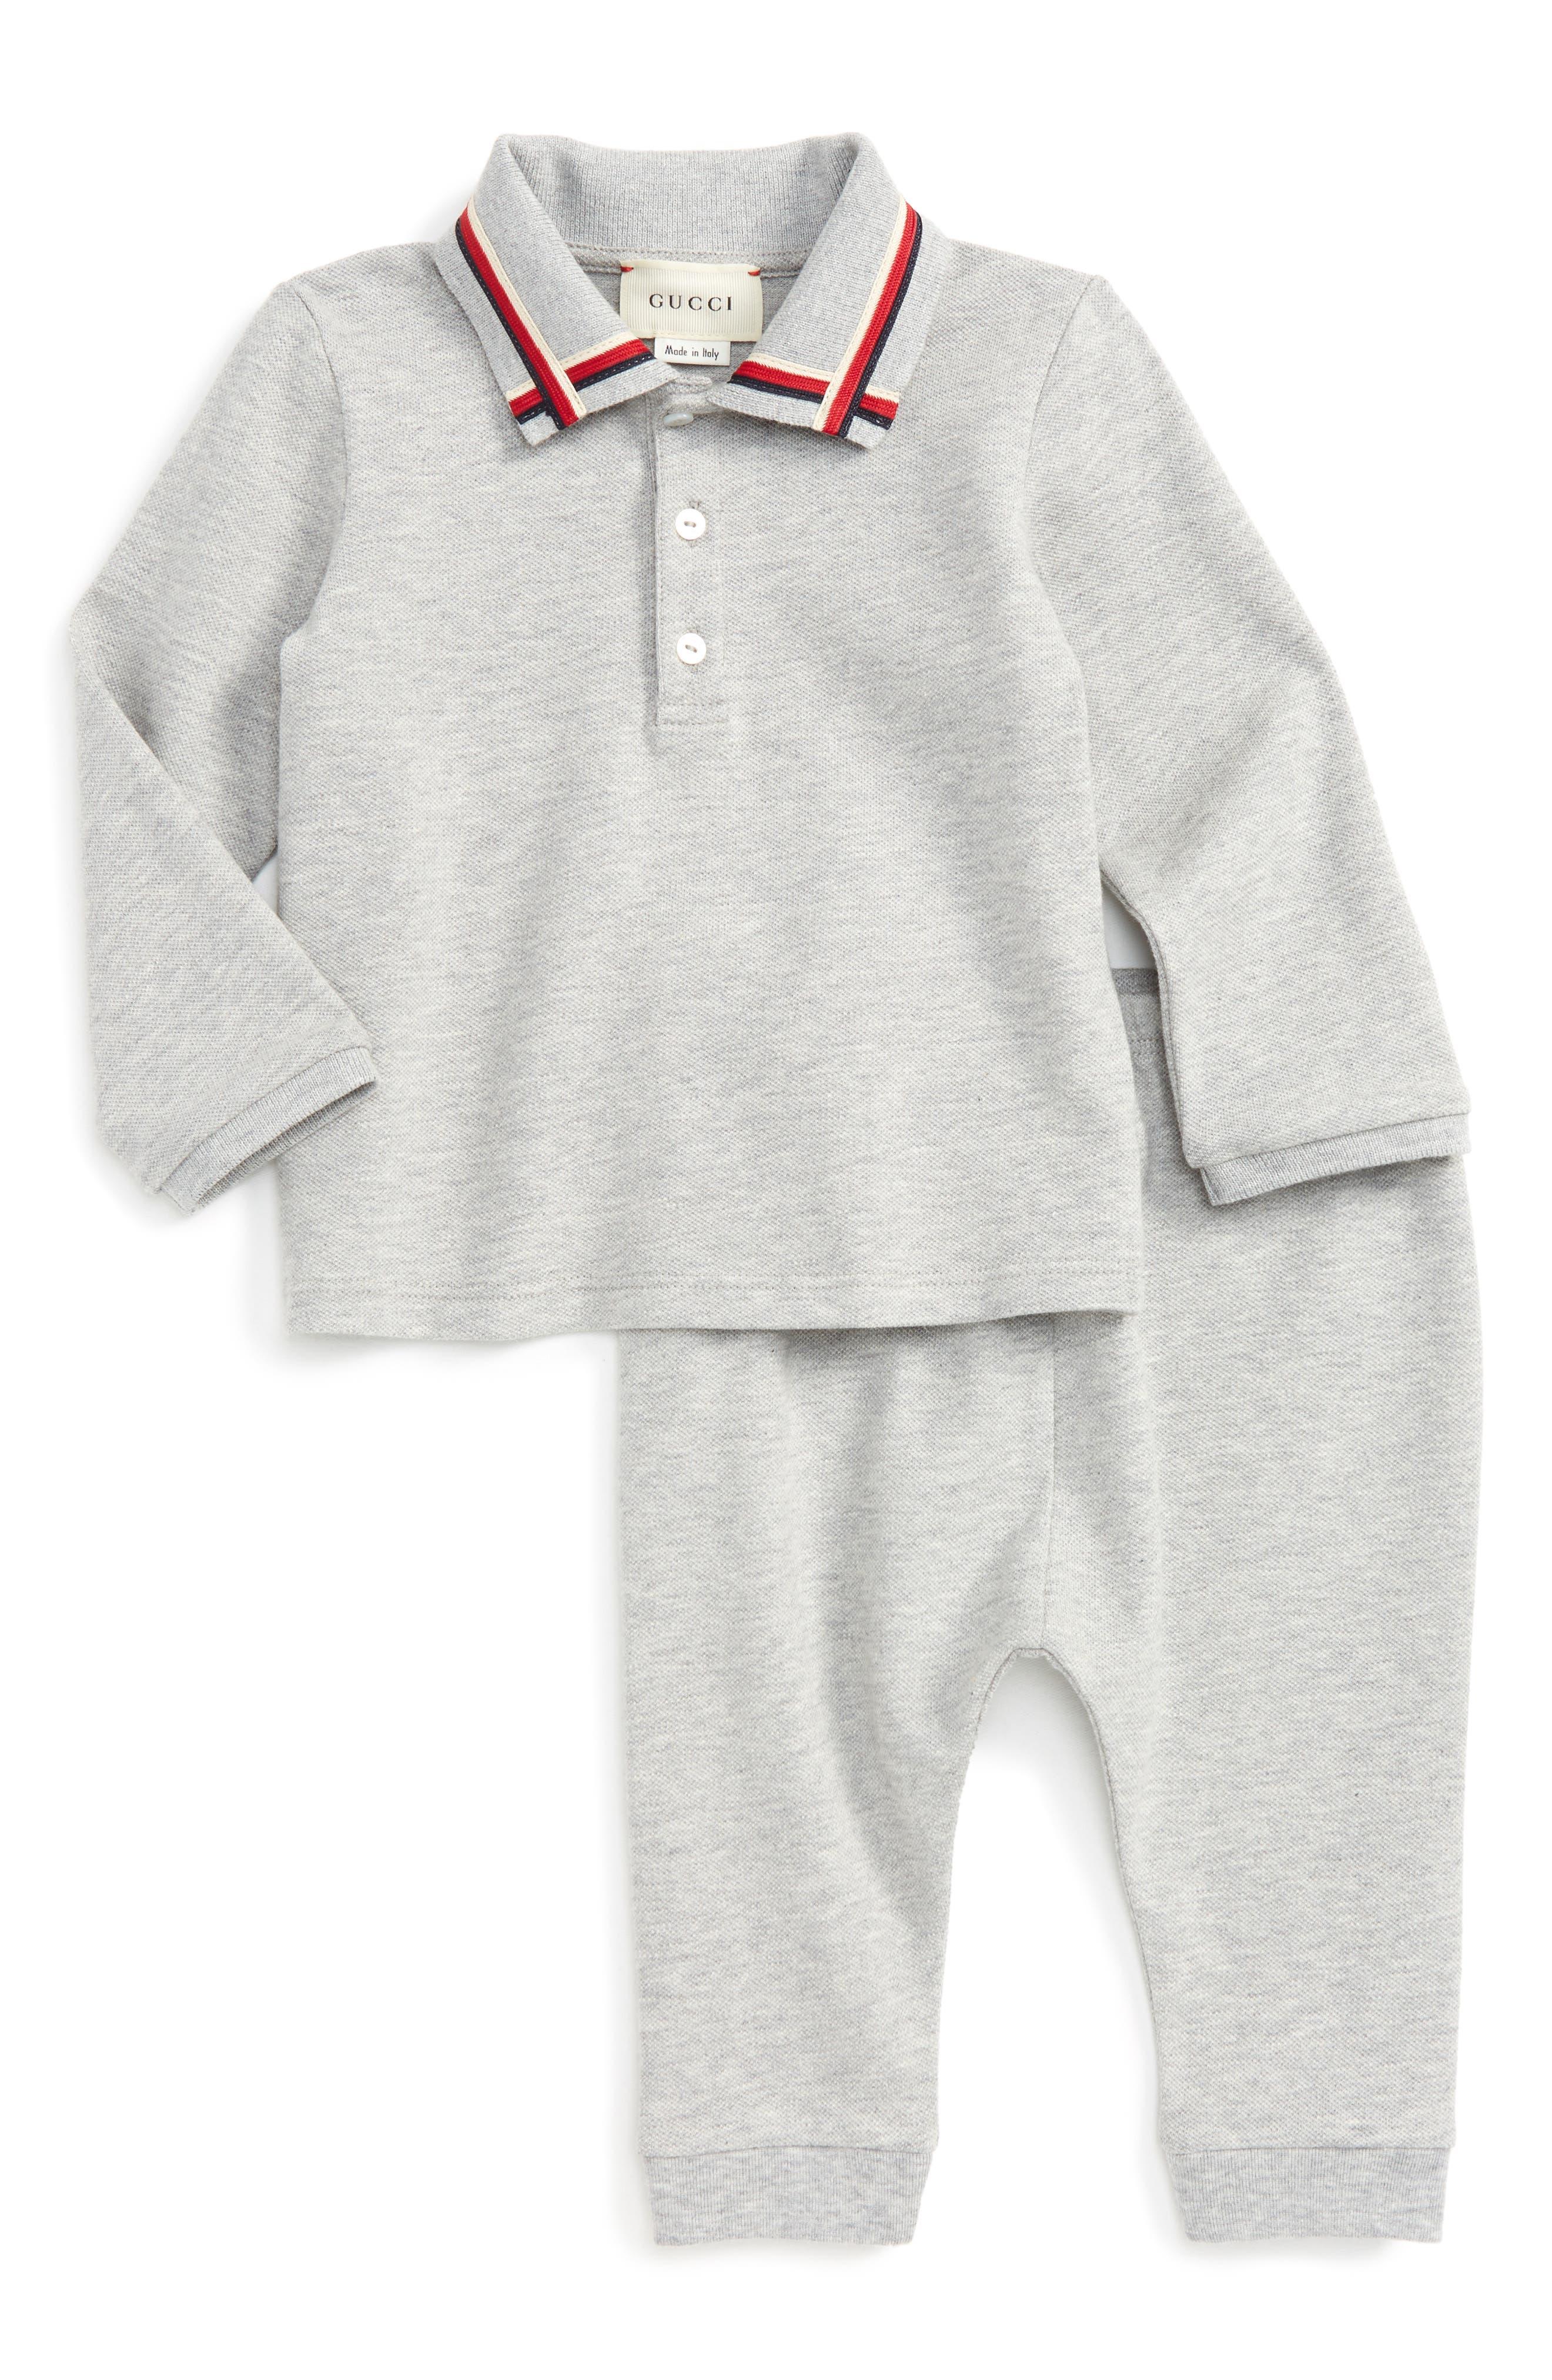 Main Image - Gucci Polo & Pants Set (Baby Boy)